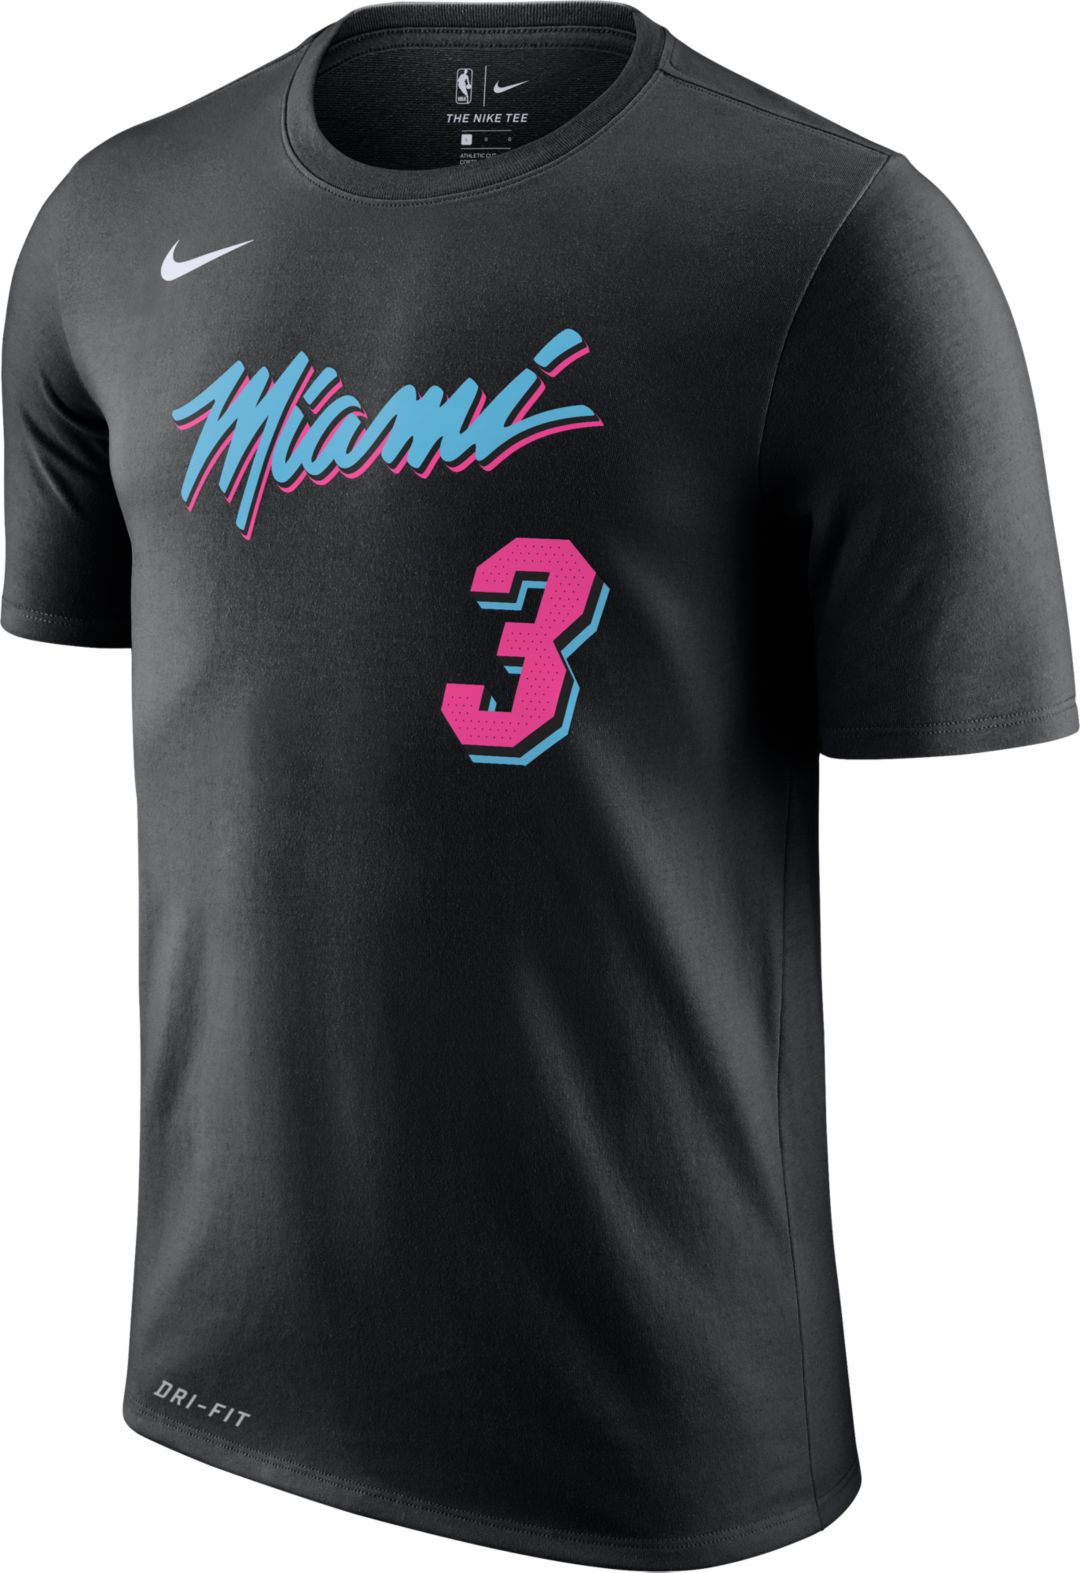 sale retailer 91fec ab3a0 Nike Youth Miami Heat Dwyane Wade Dri-FIT City Edition T-Shirt